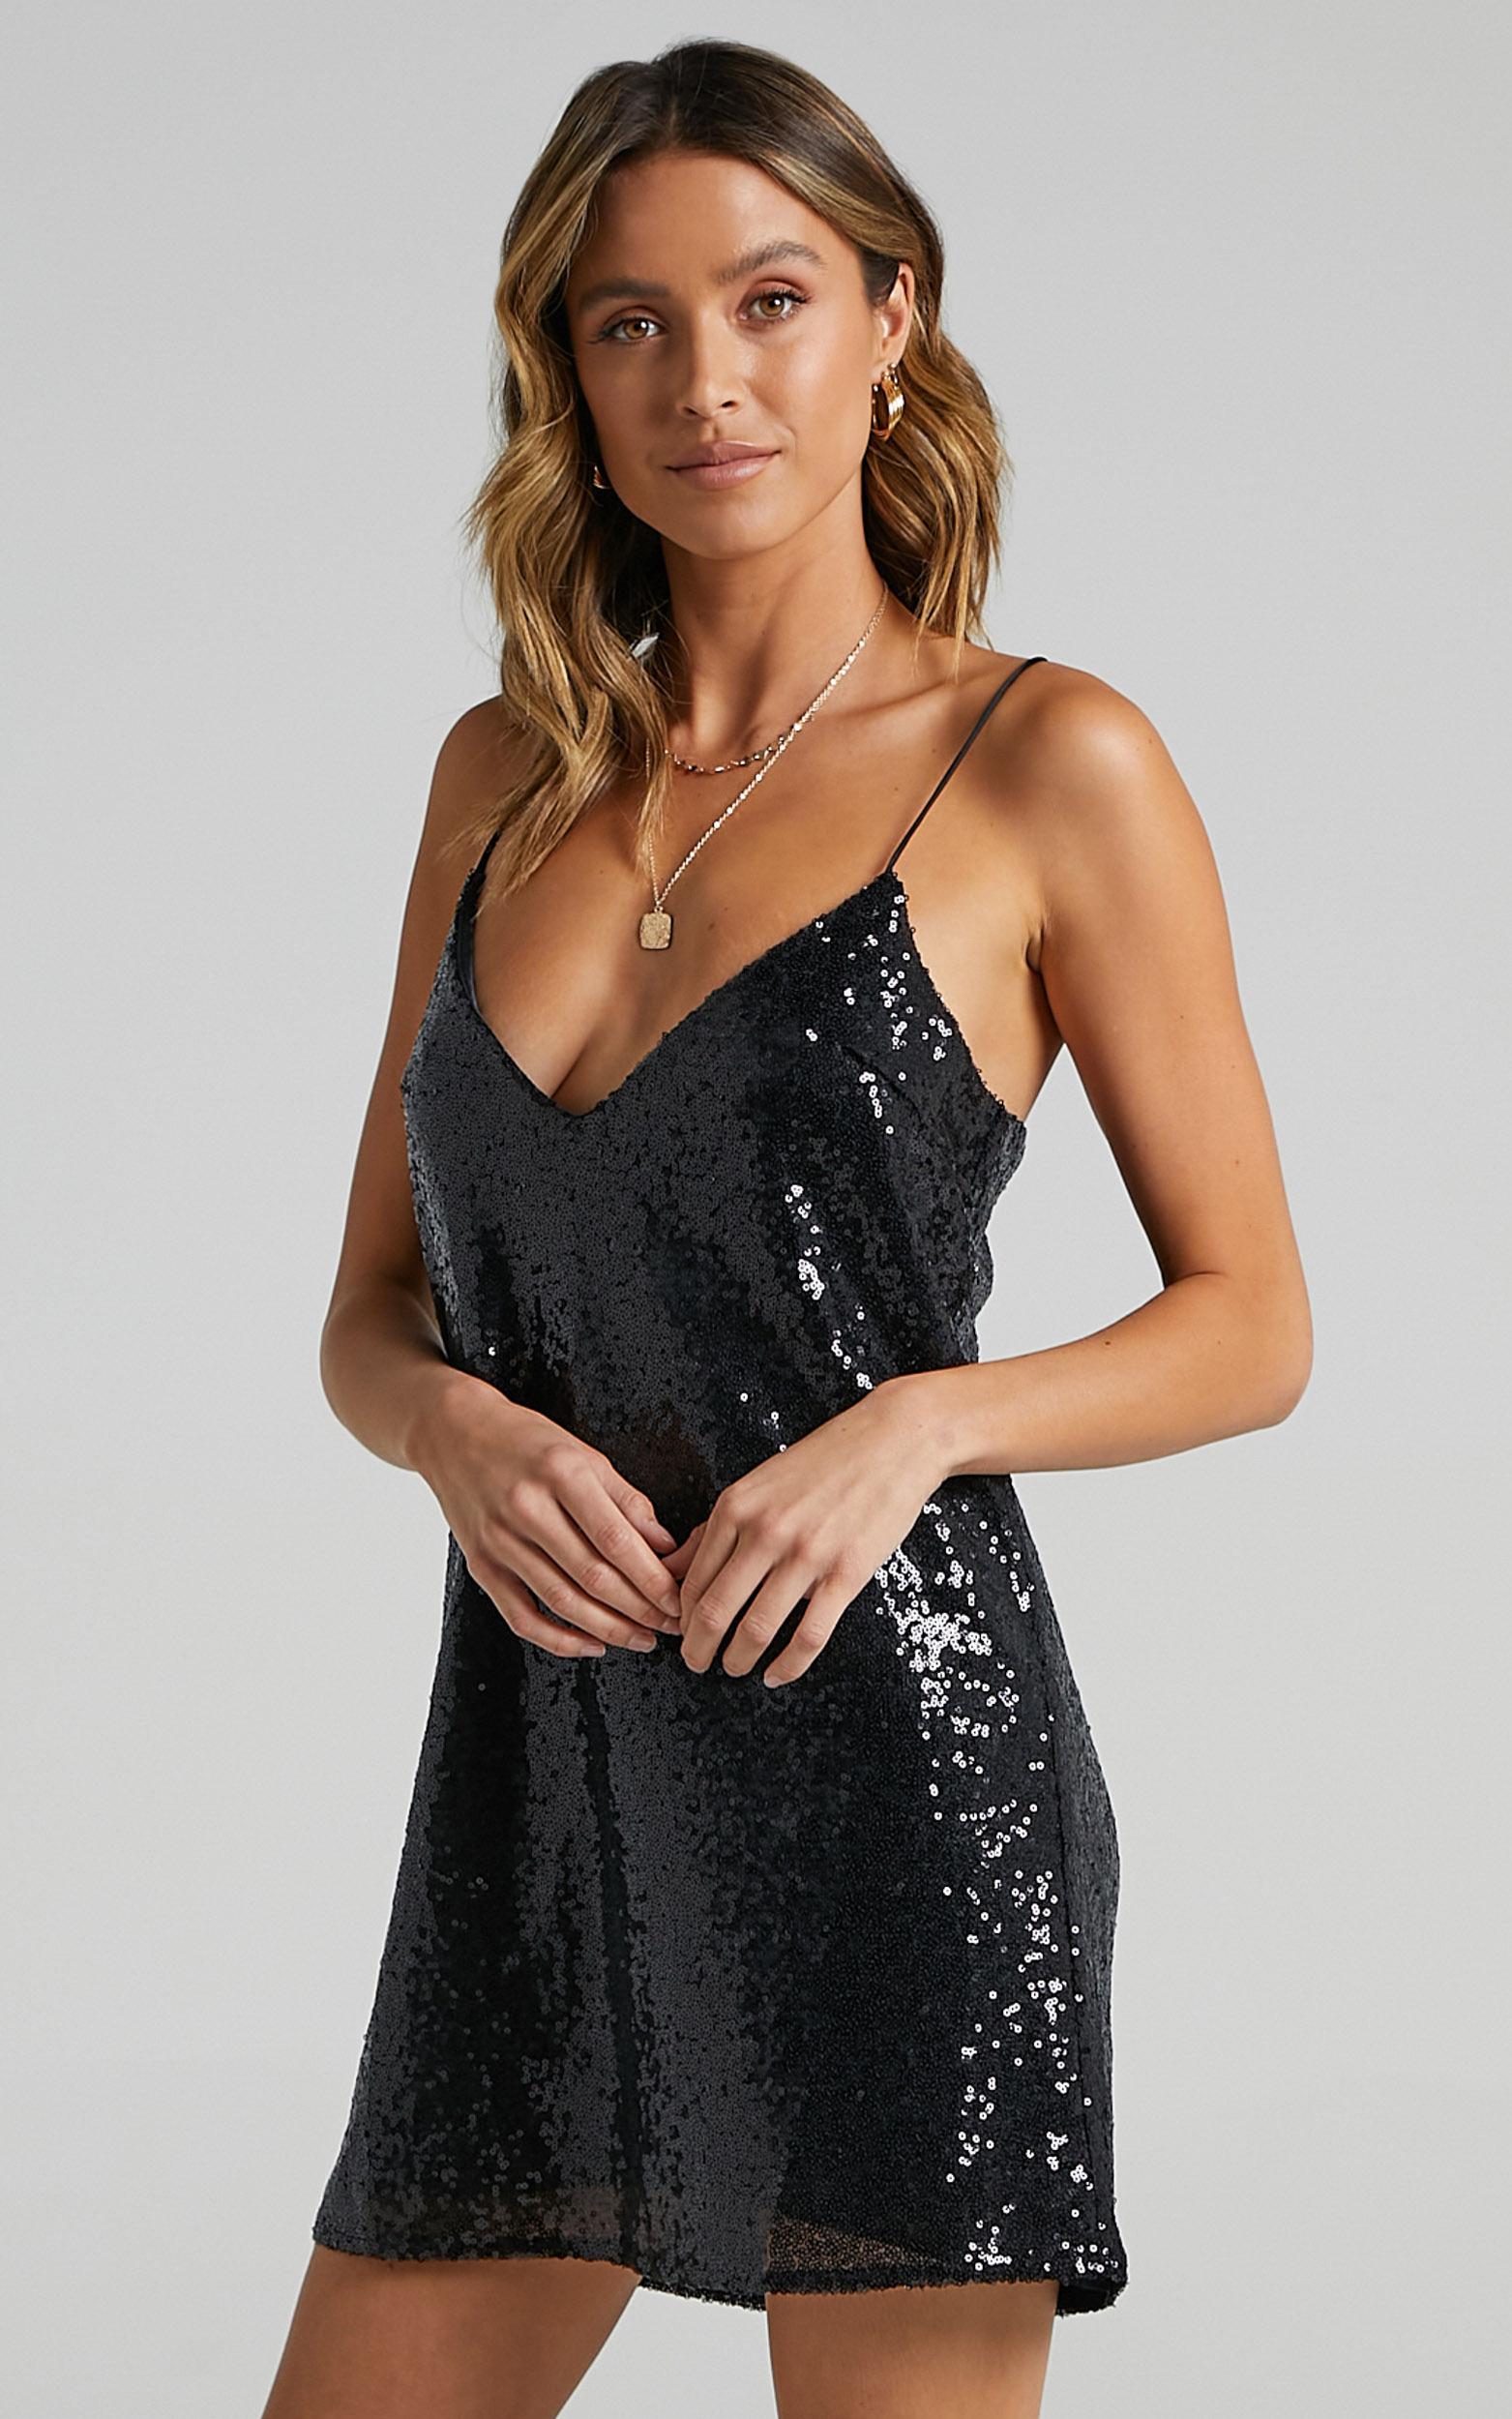 Nights In Vegas Dress in Black Sequin - 04, BLK1, hi-res image number null